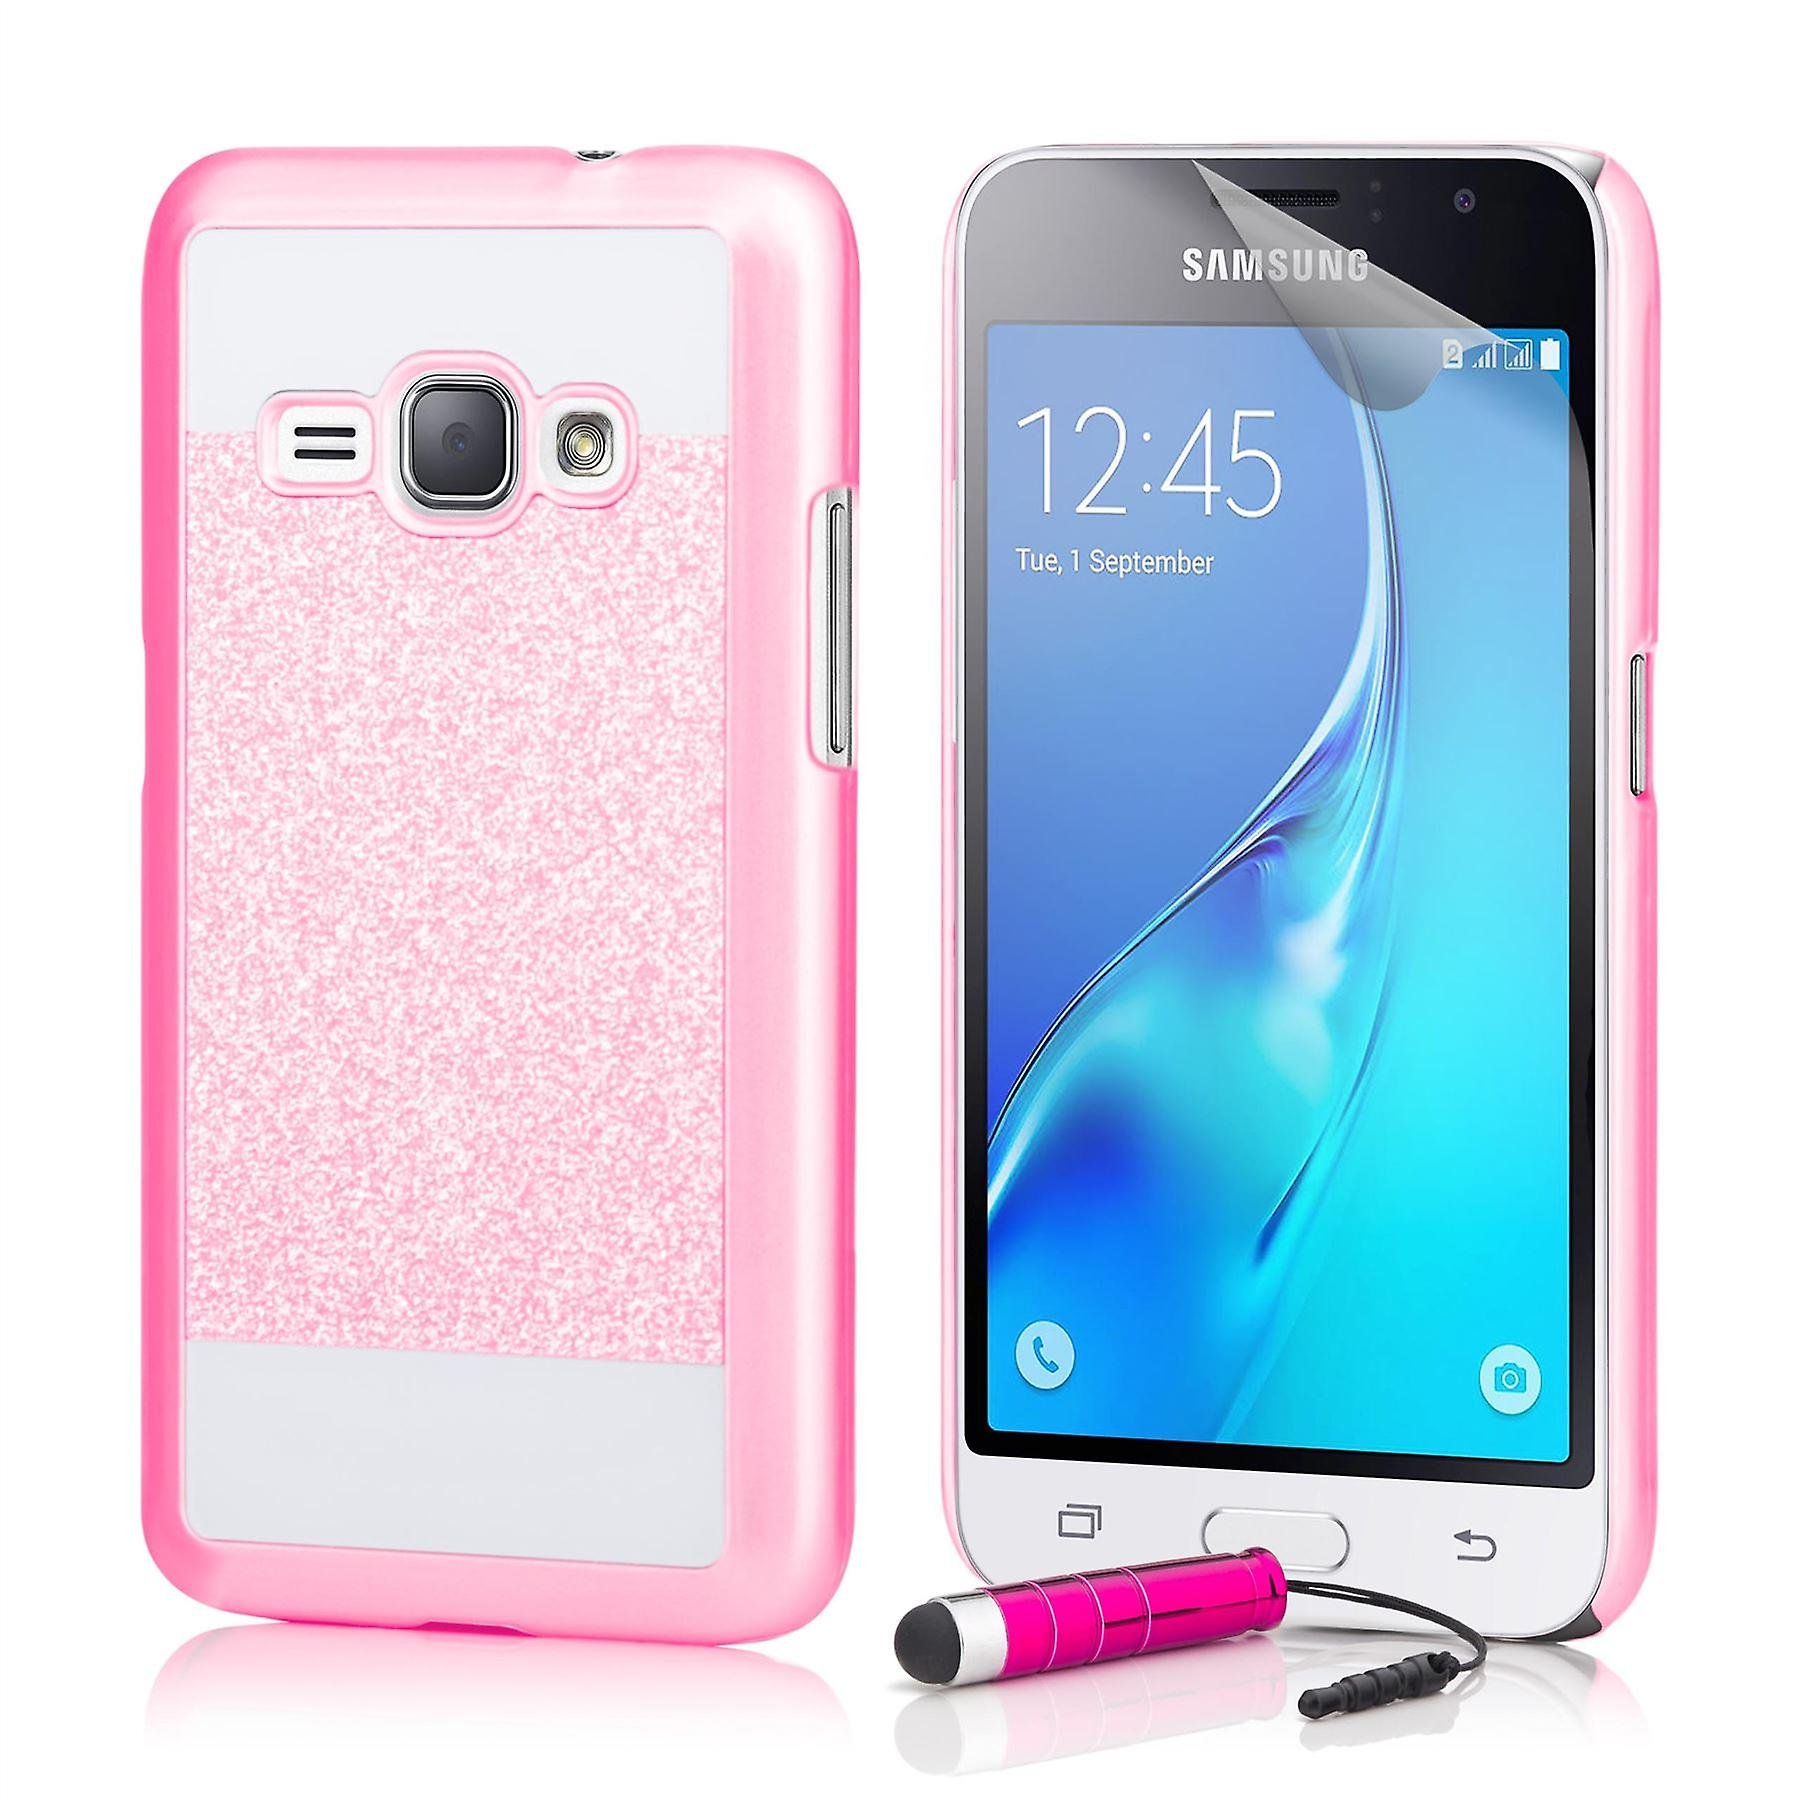 Glitter case + stylus for Samsung Galaxy J1 (2015) - Pink